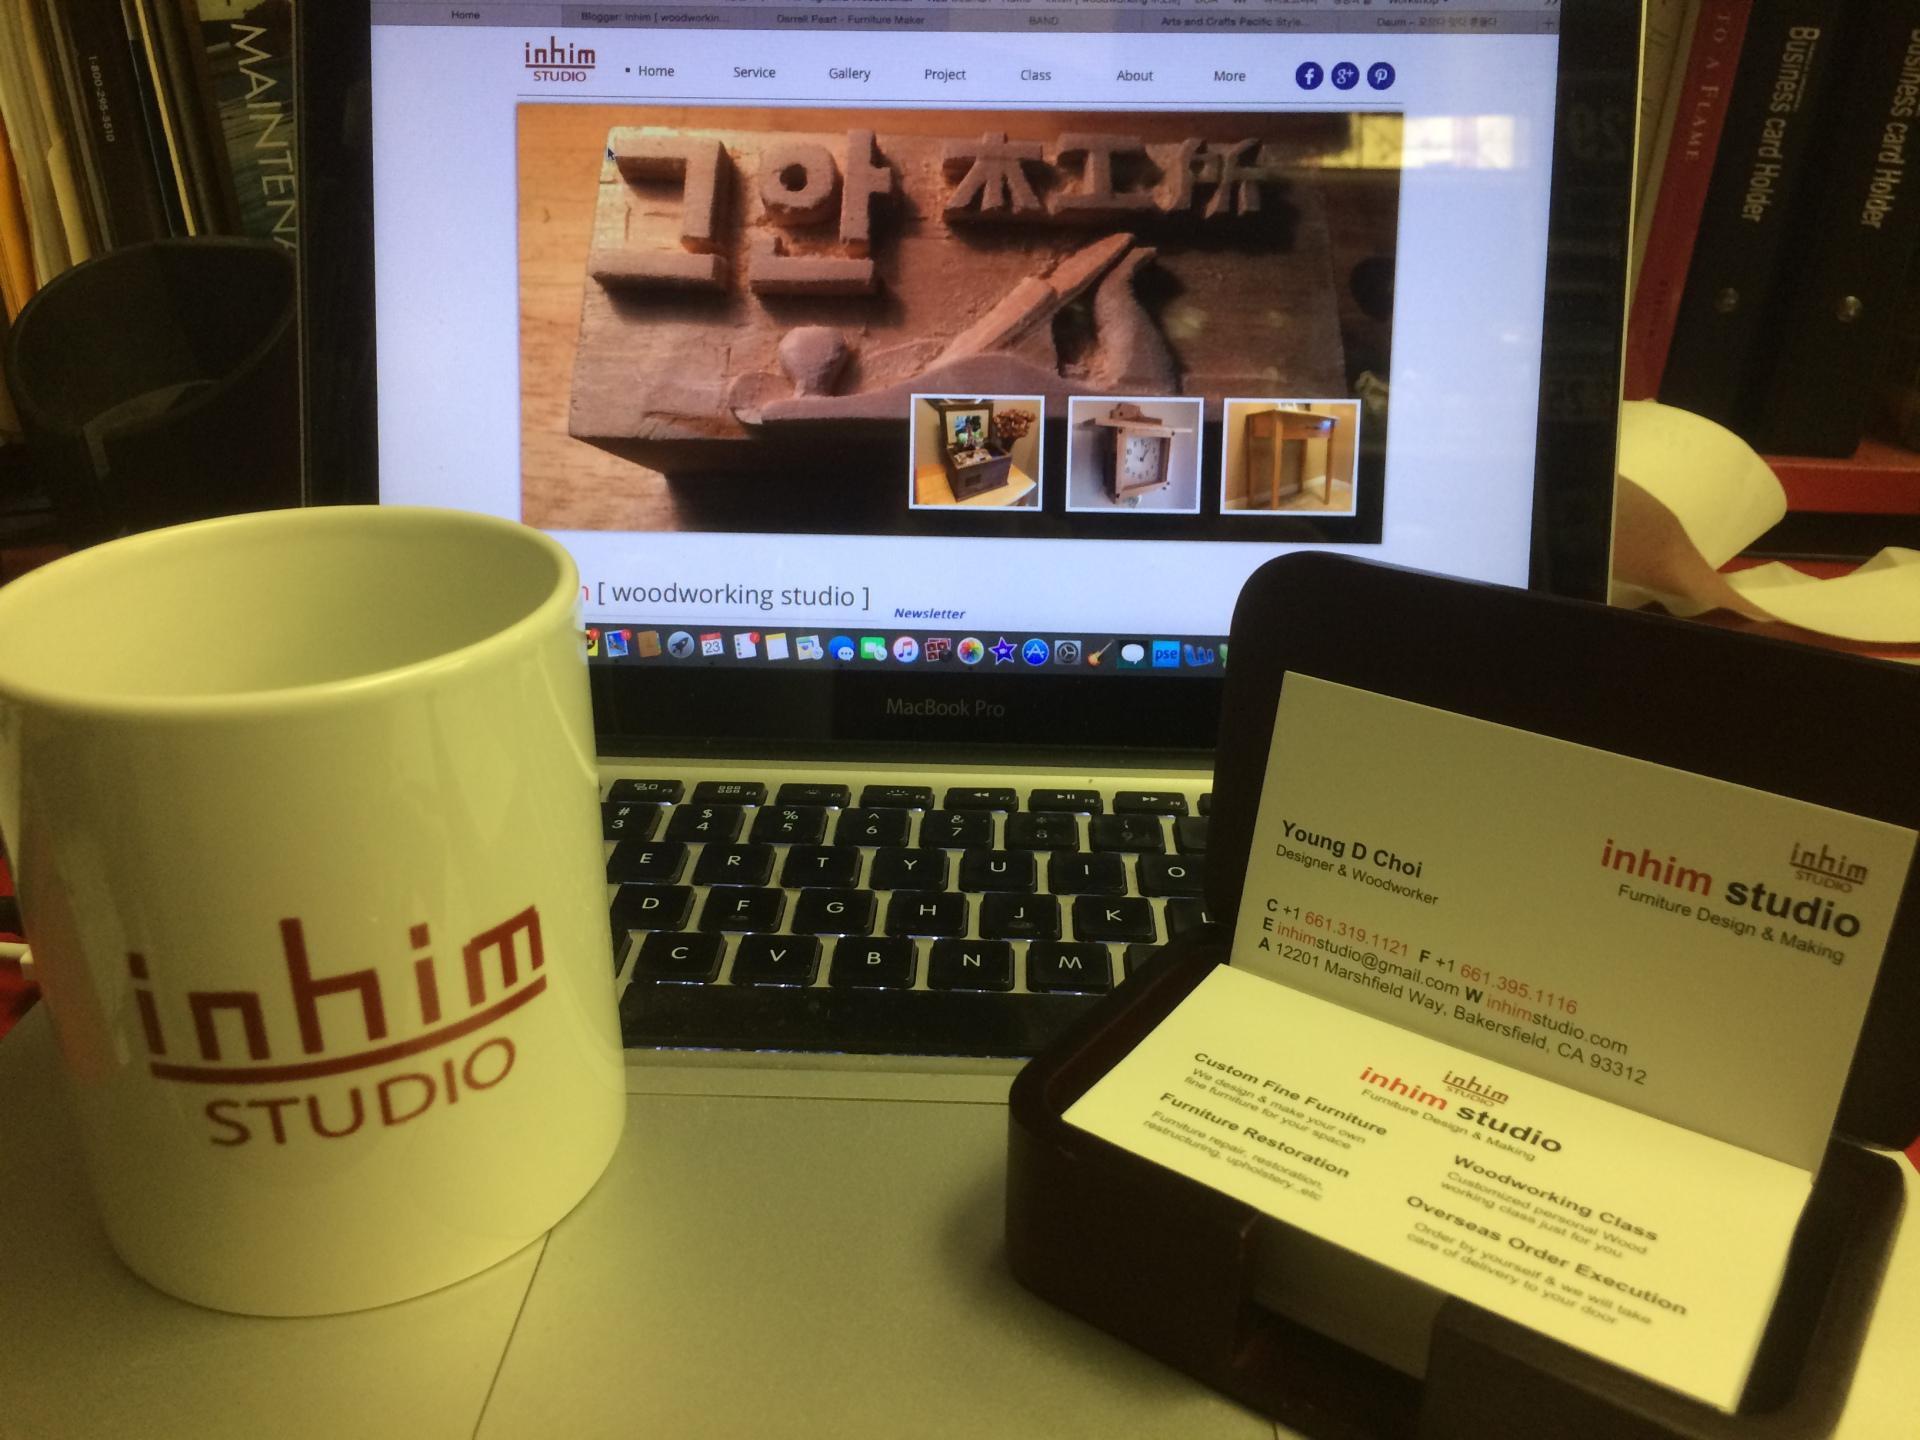 inhim studio mug cup & Biz Card